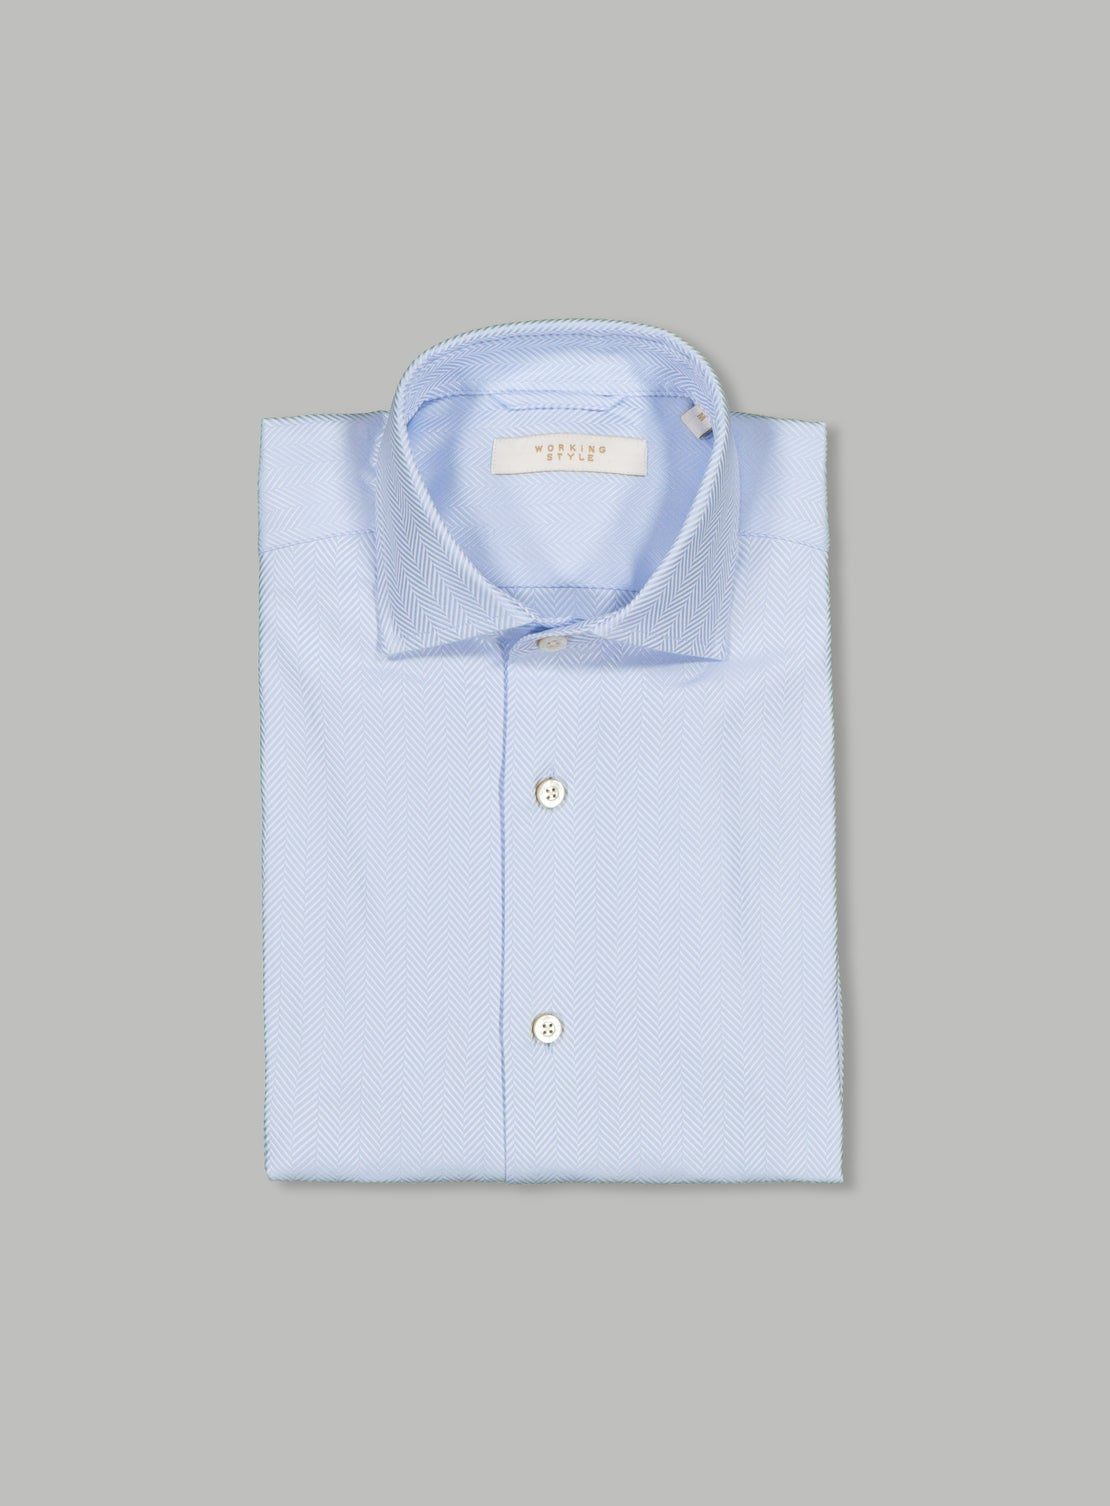 Luxe Light Blue Herringbone Shirt